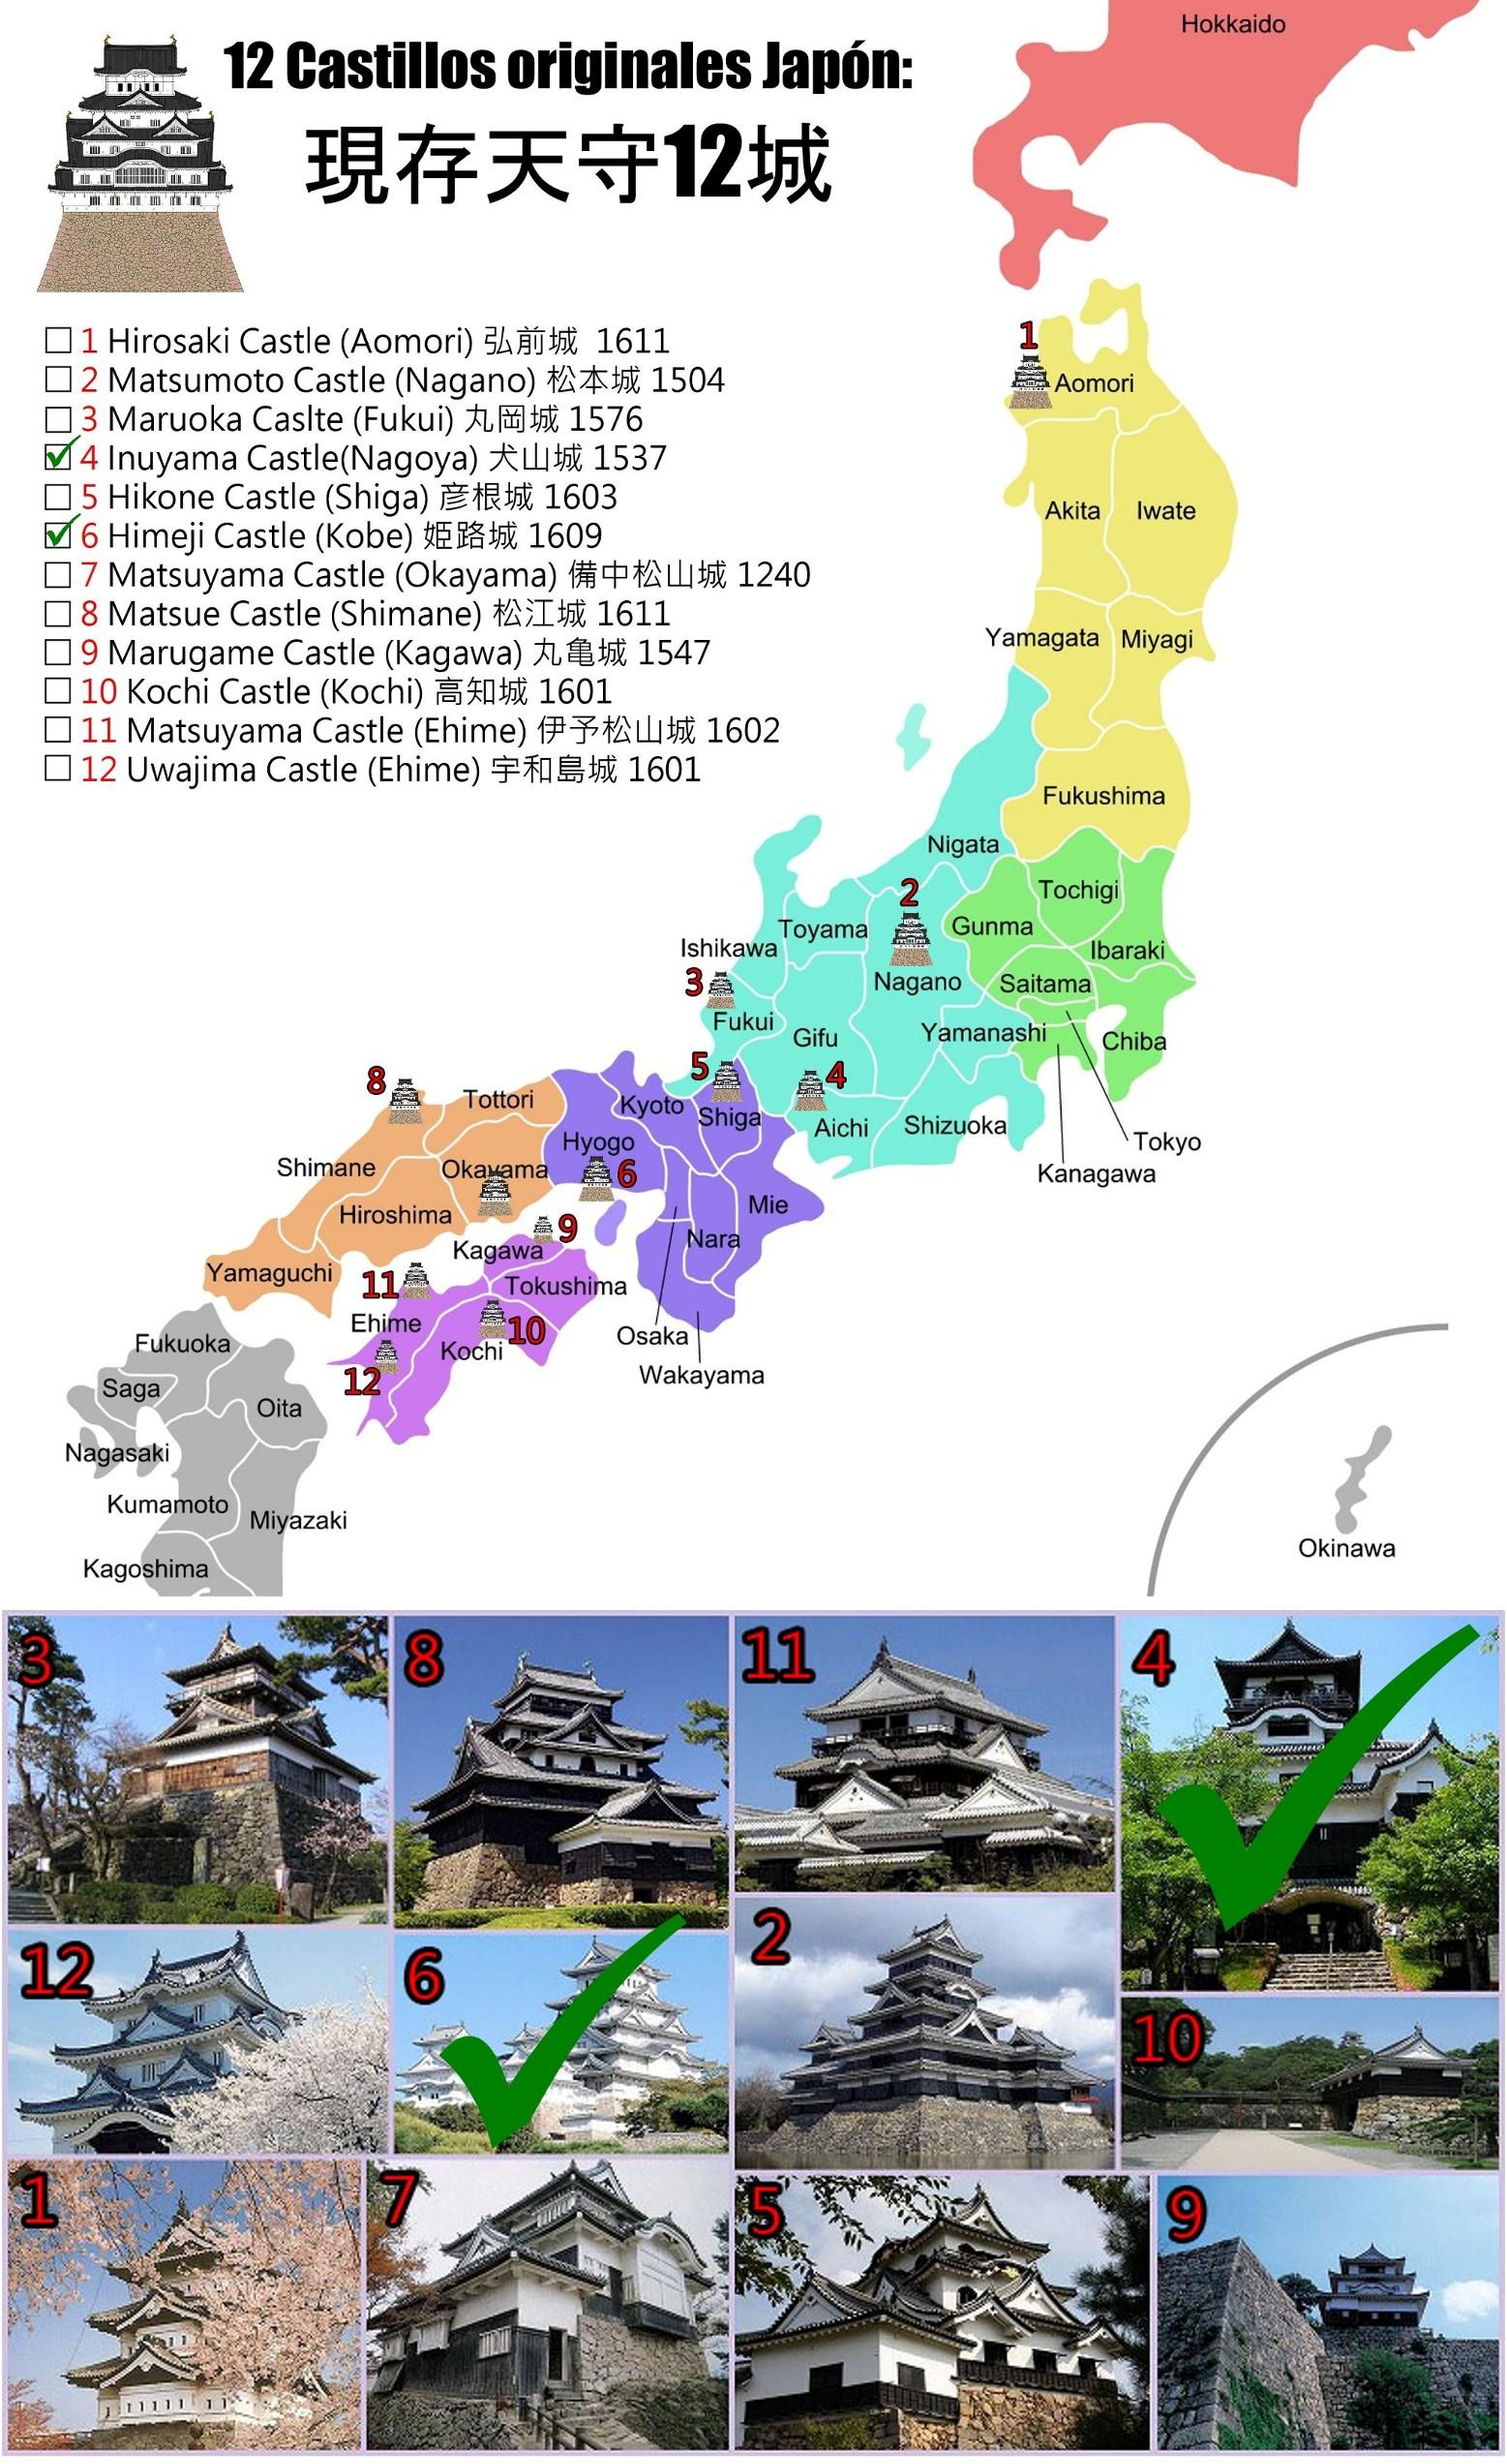 MAPA 12 castillos originales Razi pek